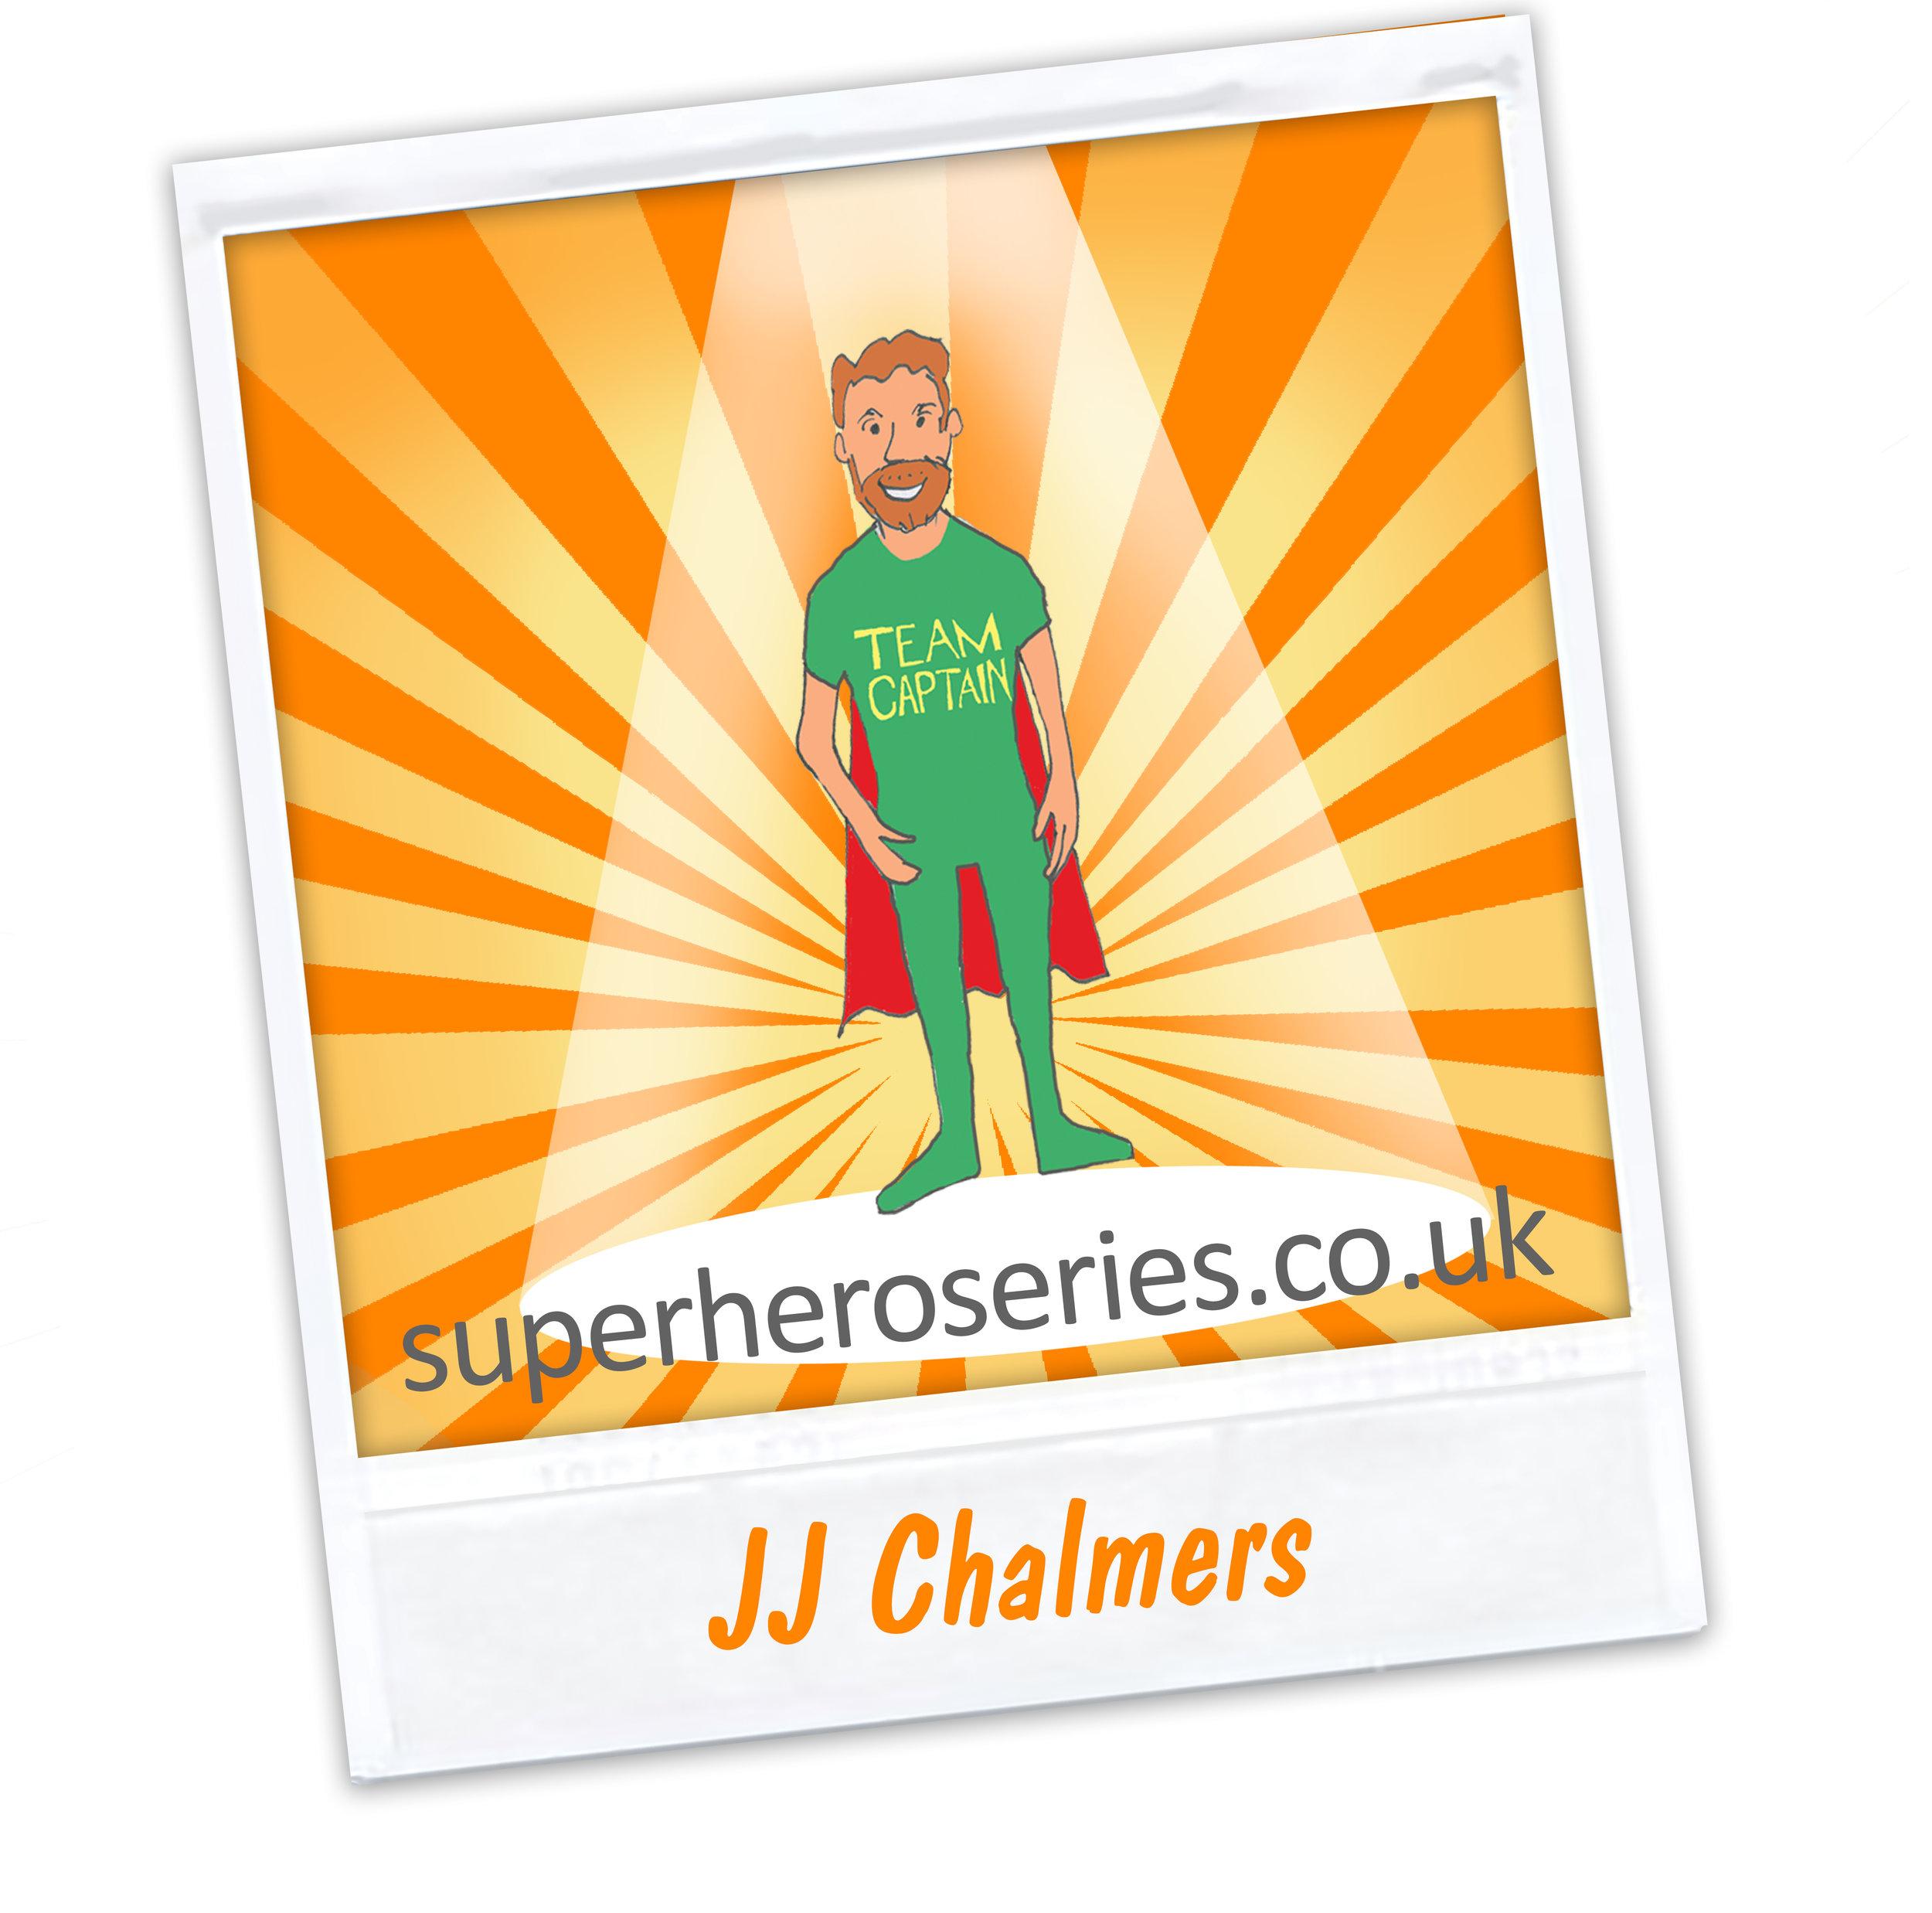 JJ Chalmers Left.jpg